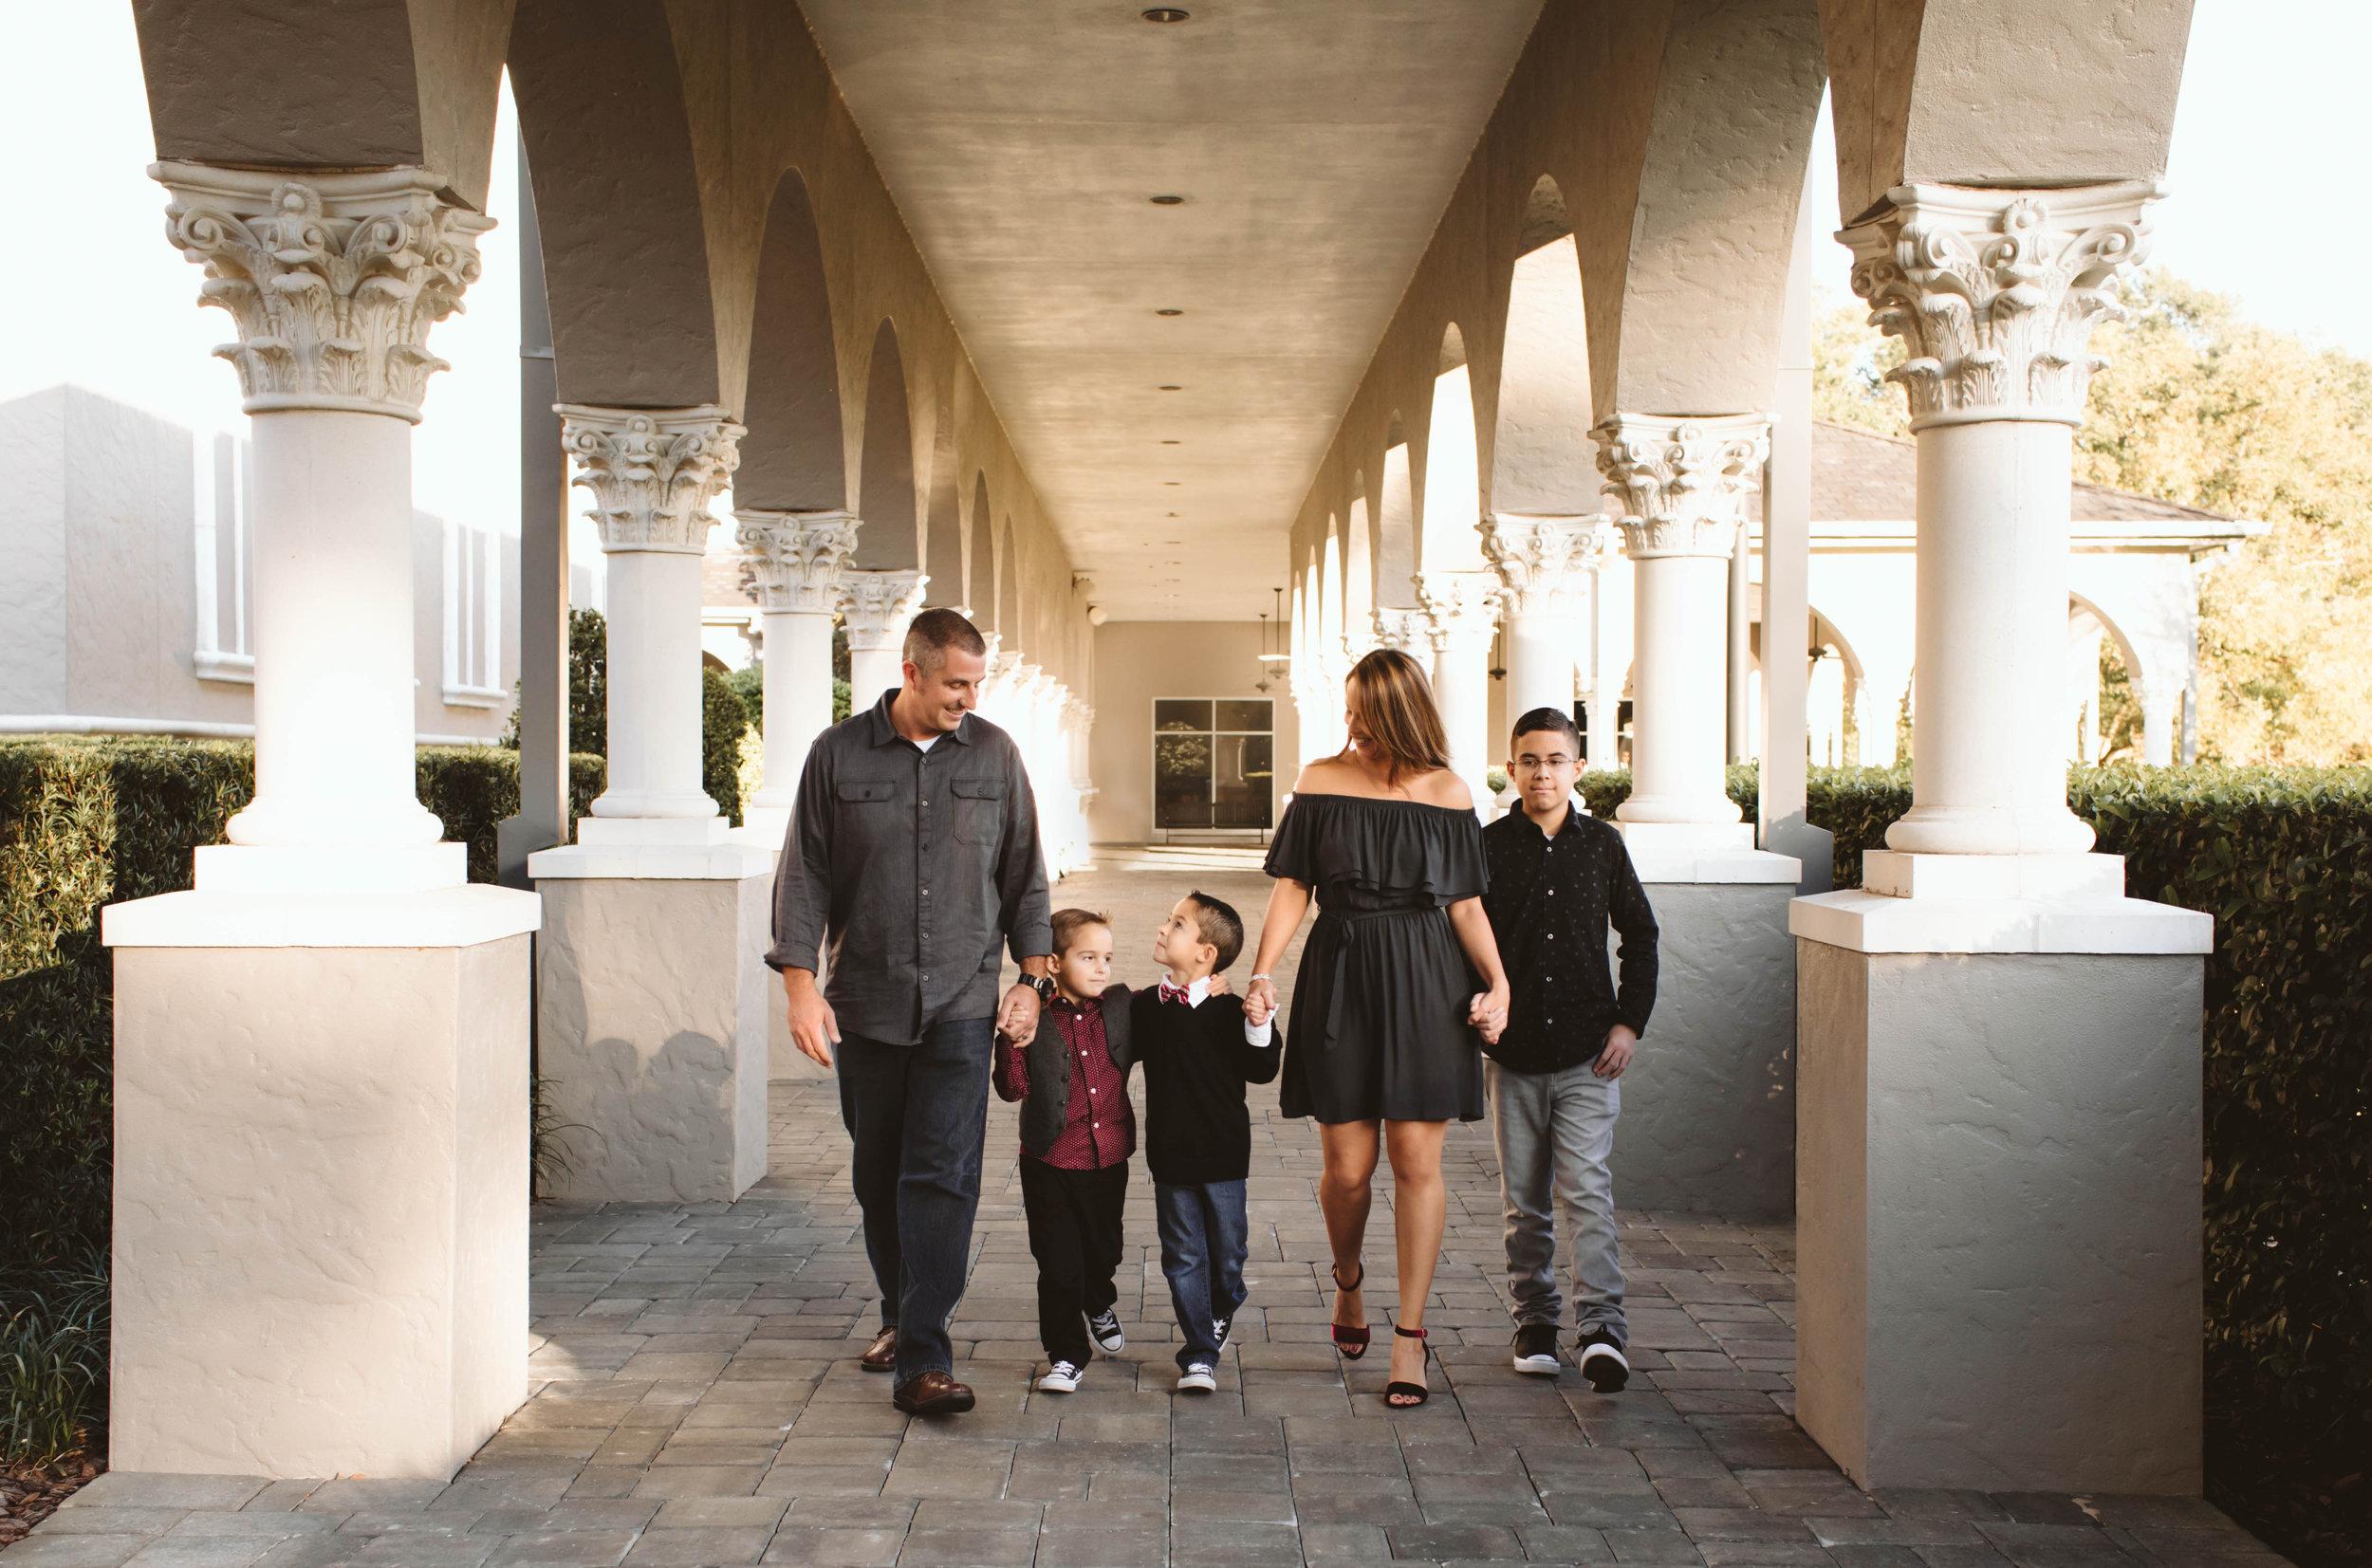 Coyne Family - A Family Lifestyle session |Sanford, FL.